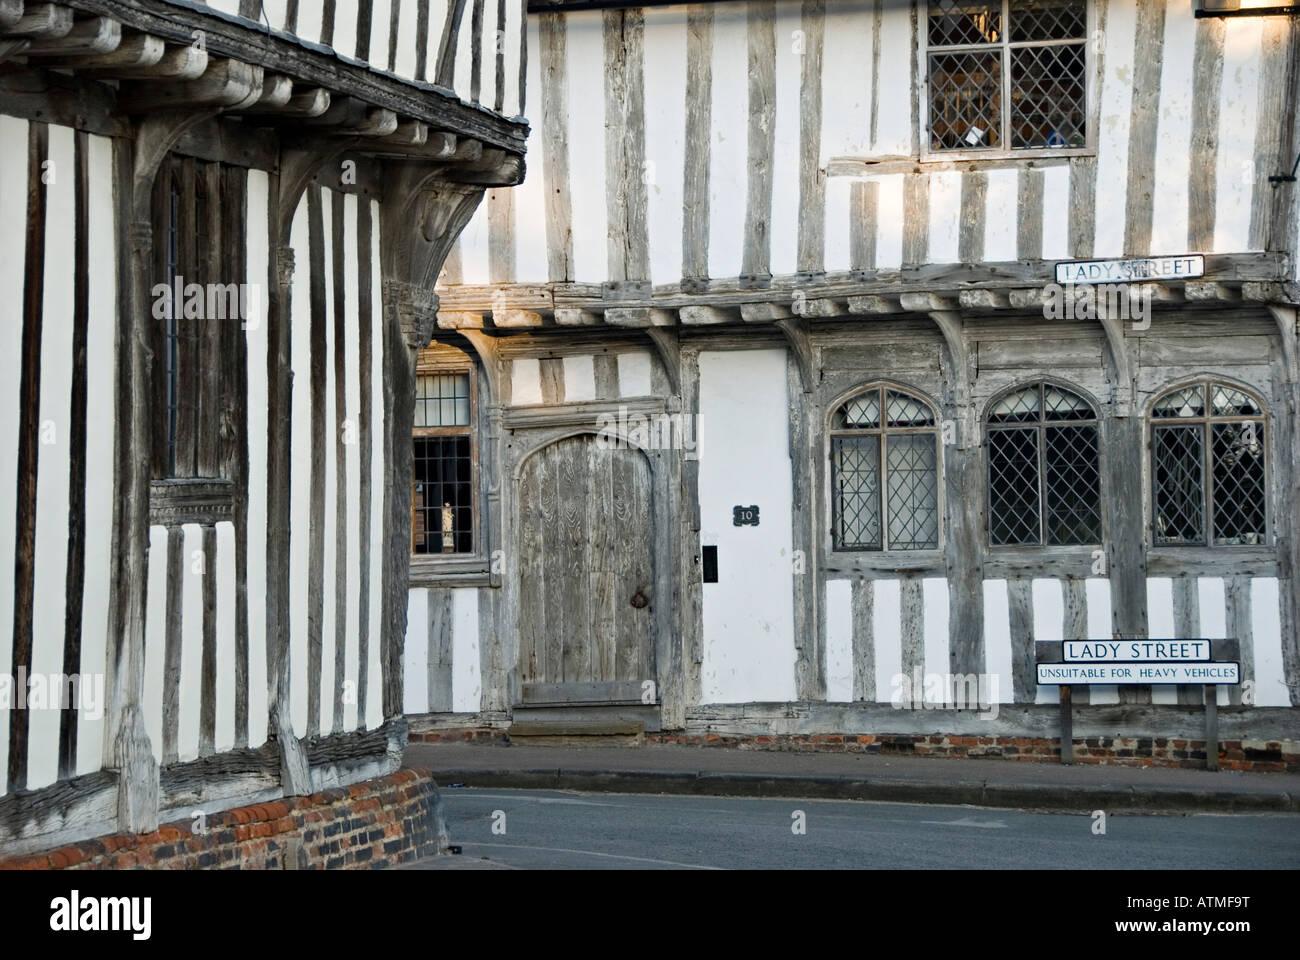 Lavenham, Suffolk, UK. Old Tudor shops in Lady Street - Stock Image